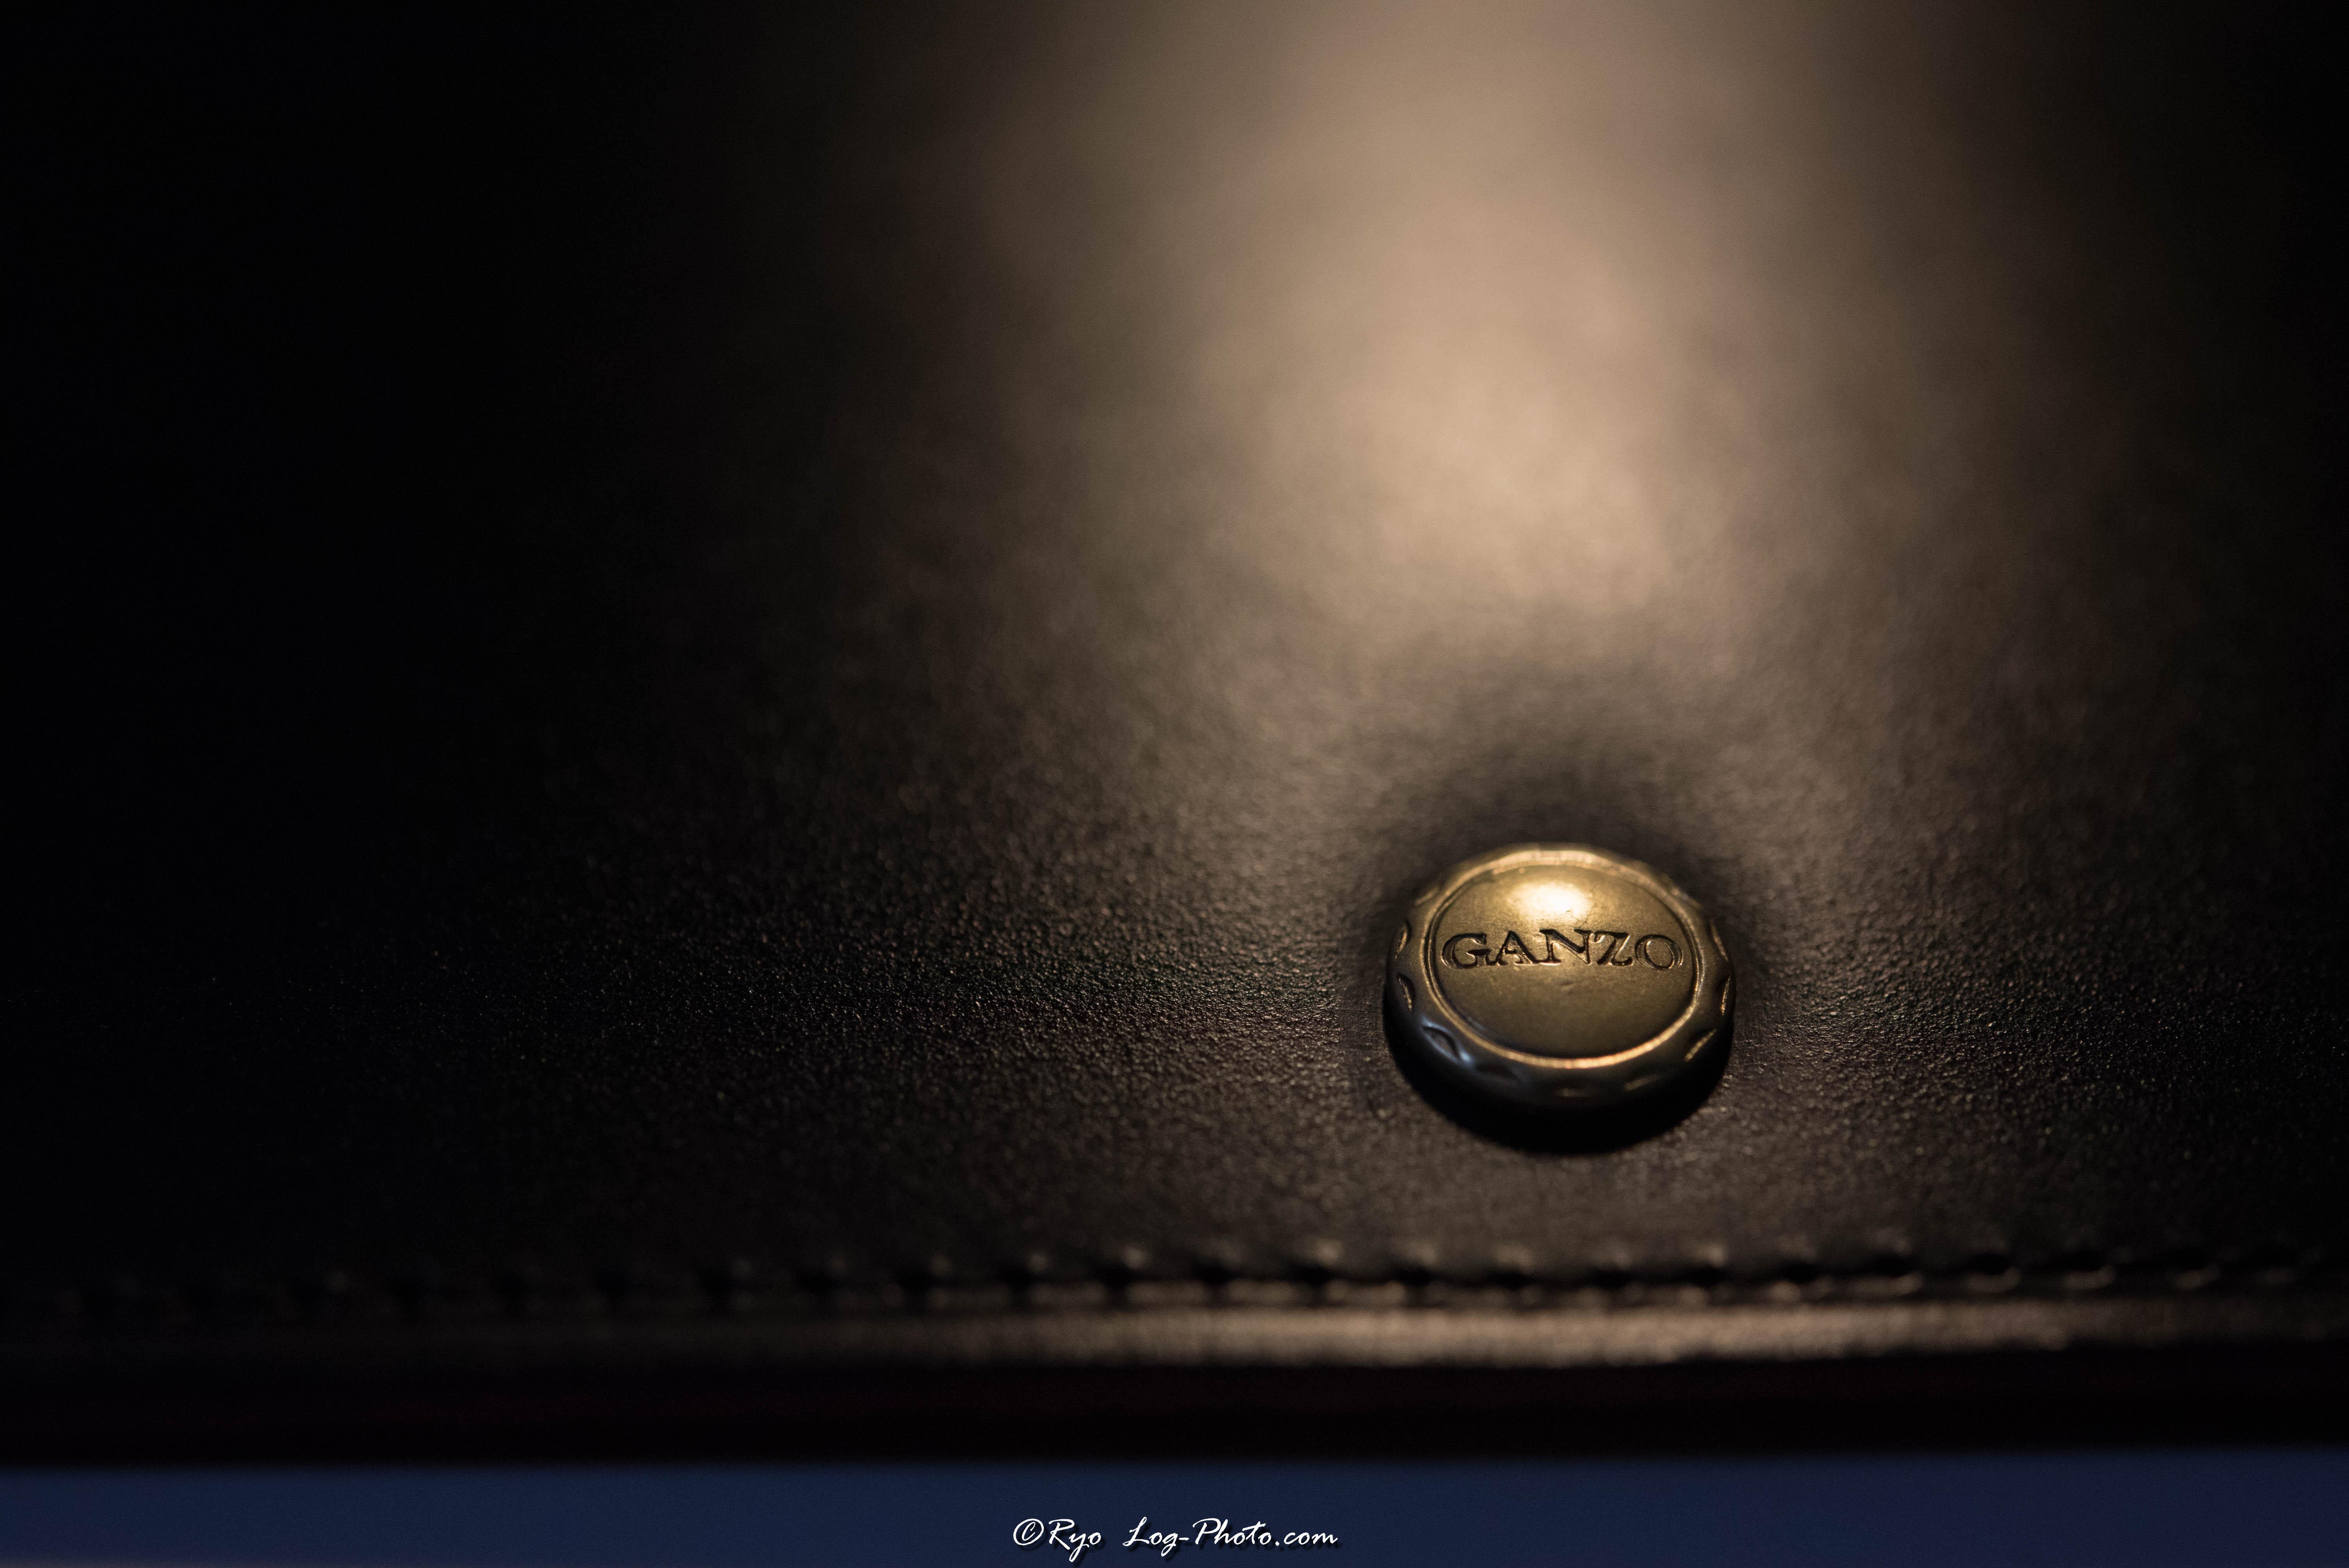 ganzo(ガンゾ)のブライドルレザー 財布 留め具